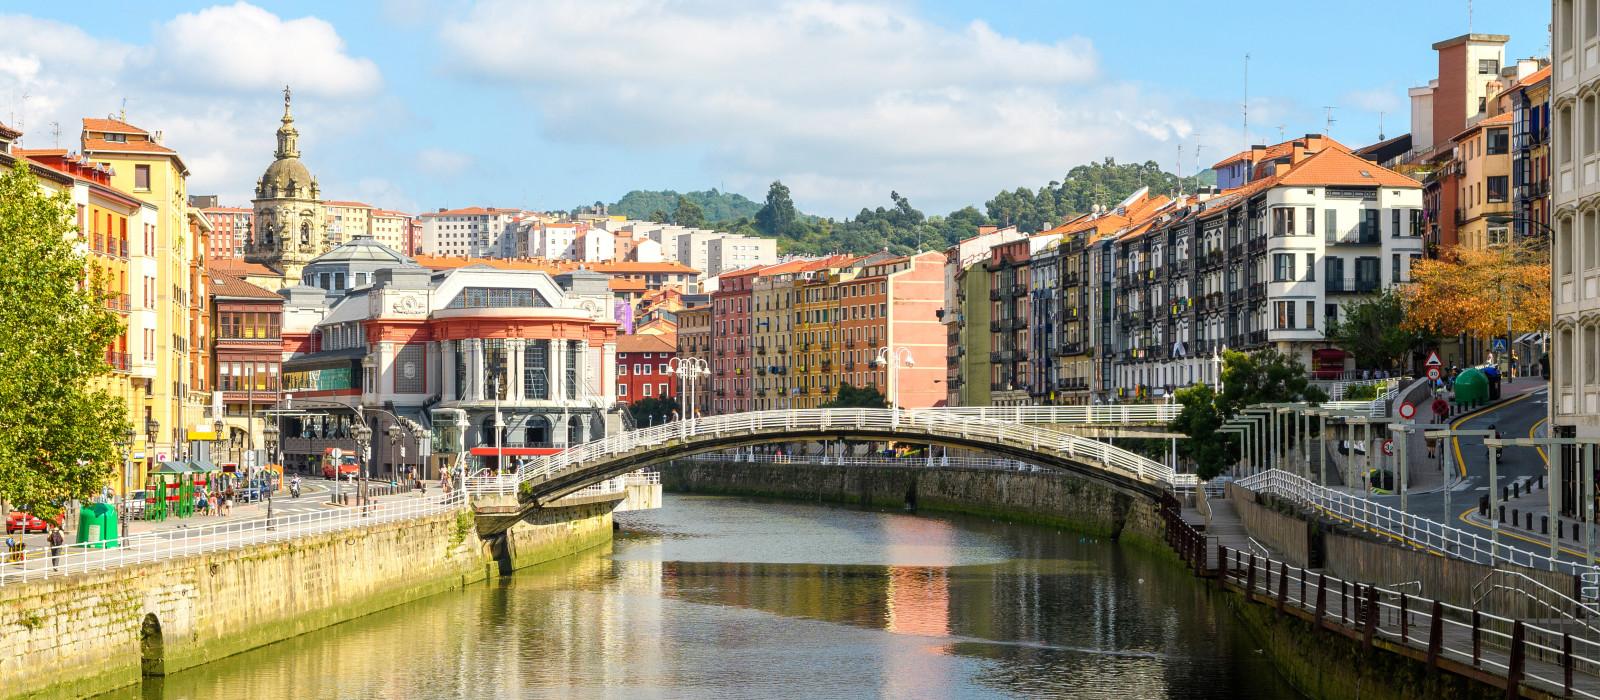 Reiseziel Bilbao Spanien